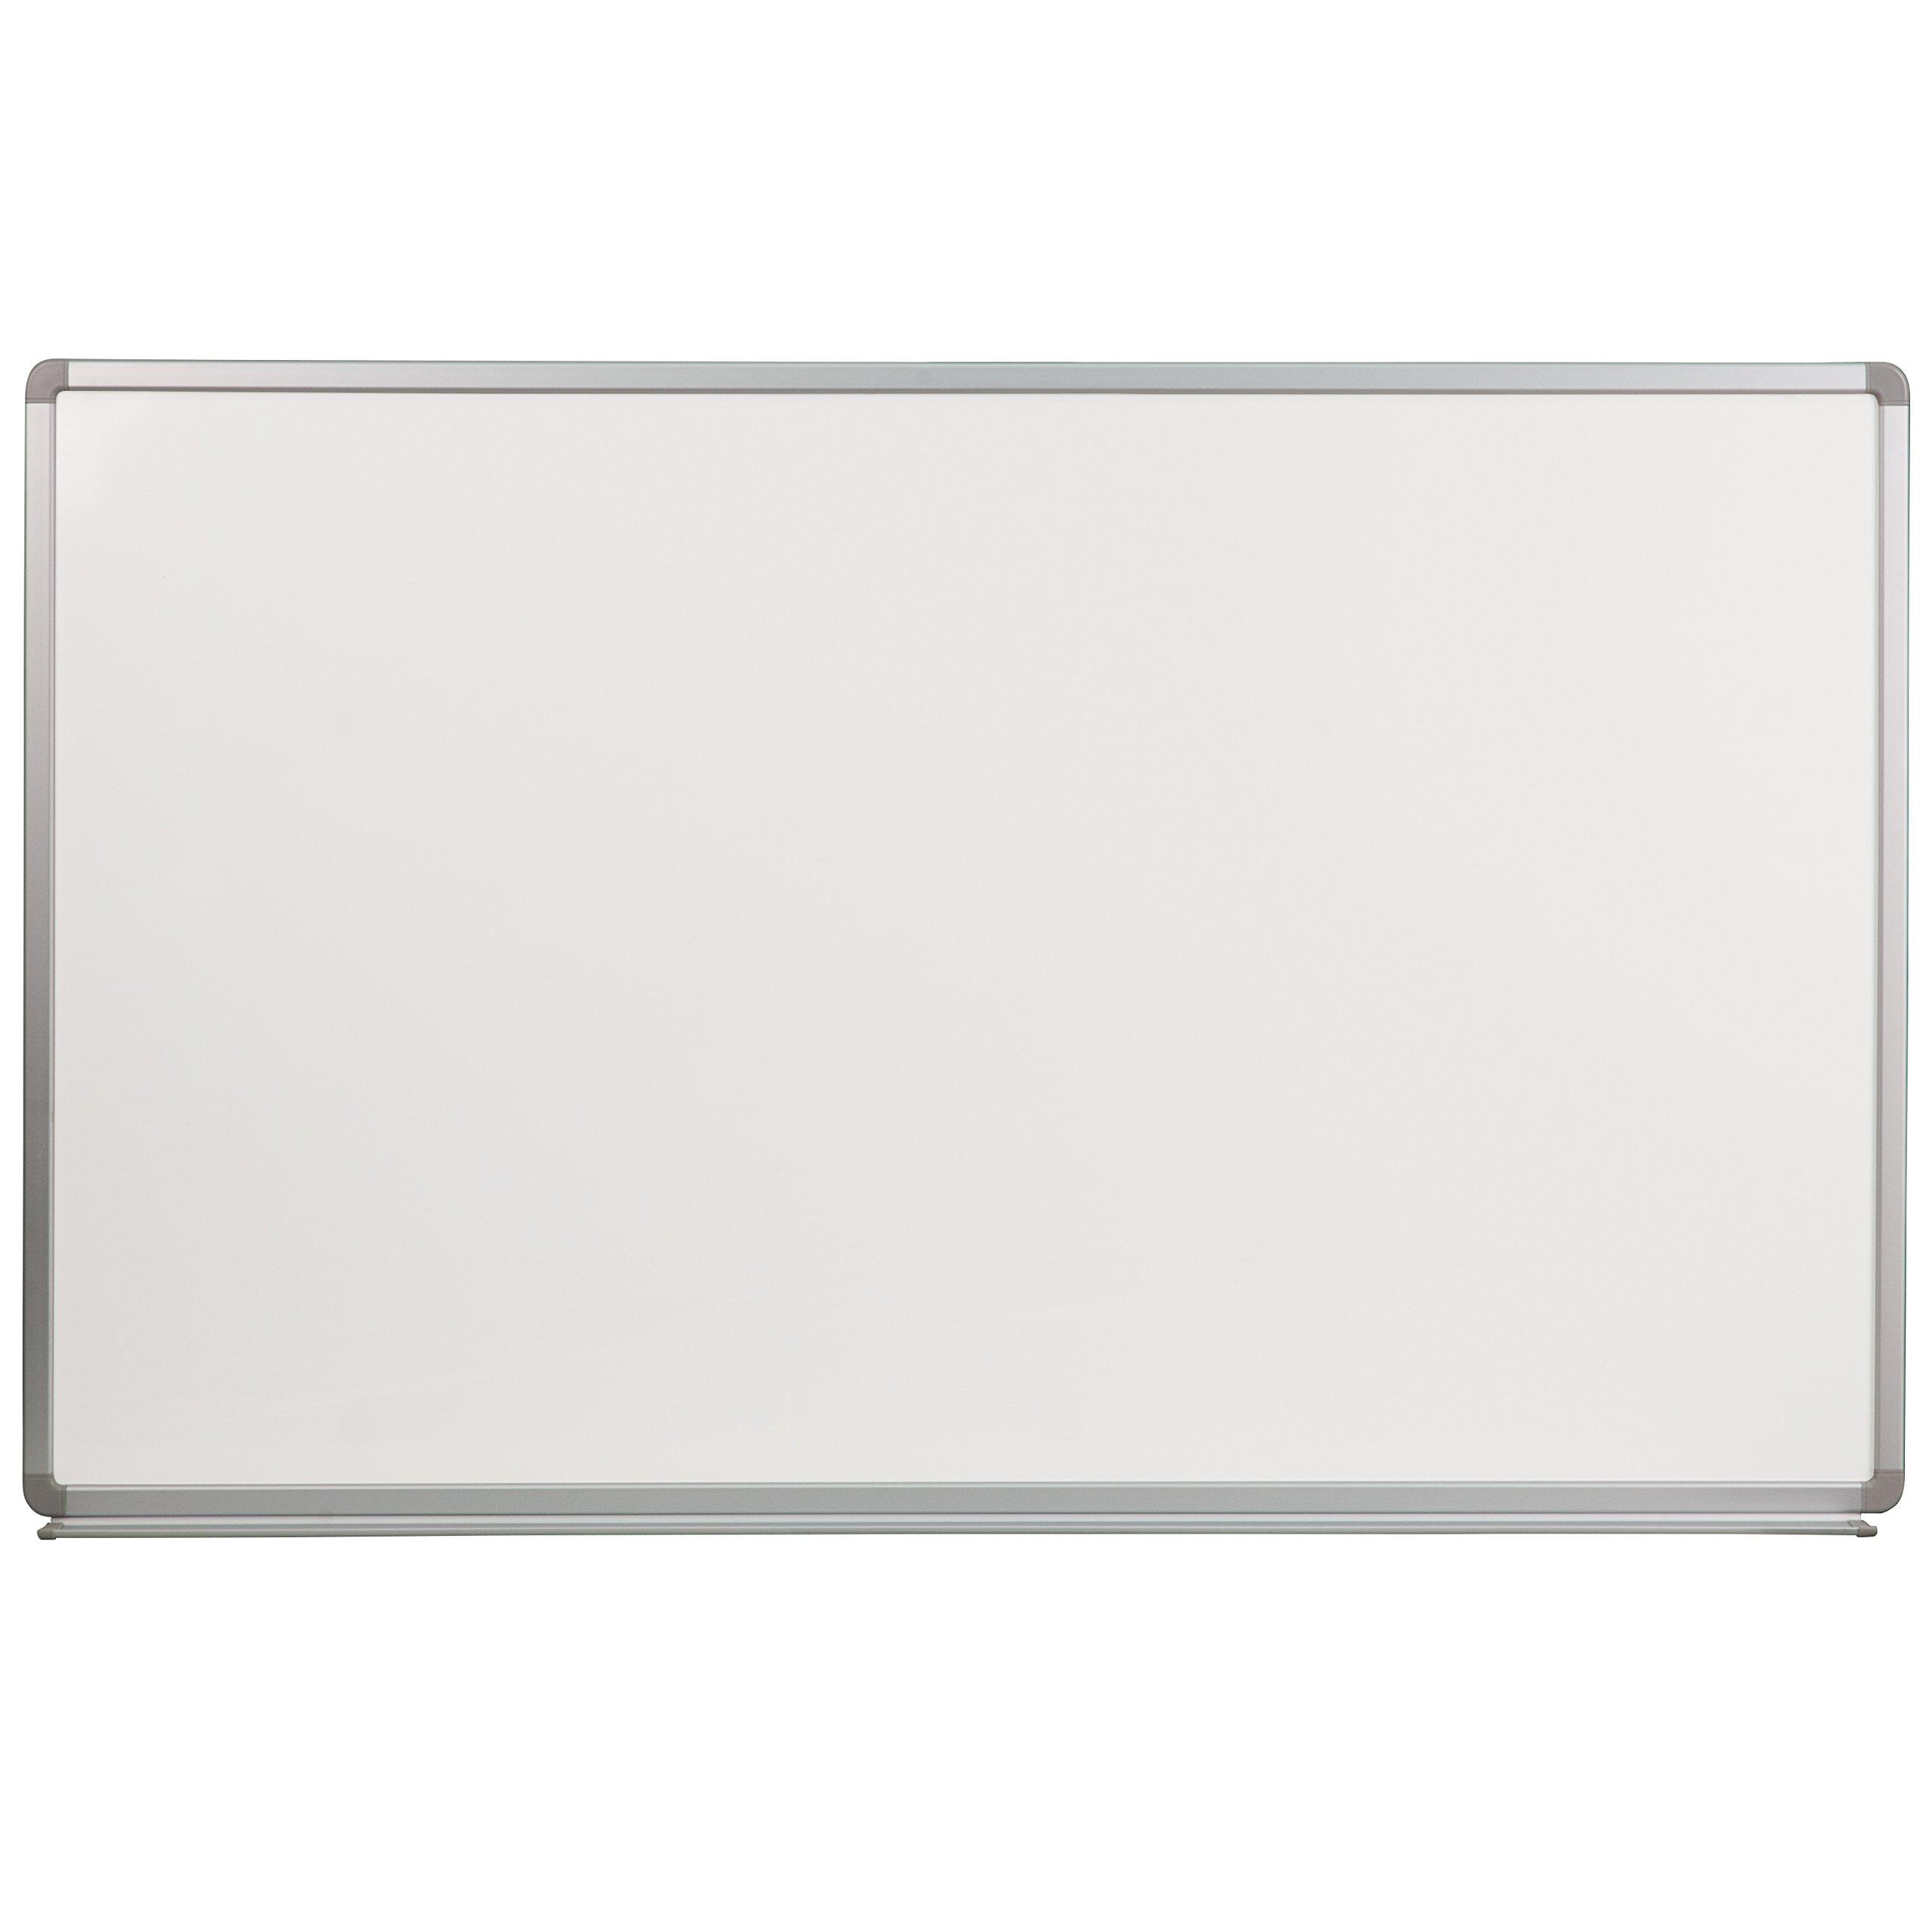 Flash Furniture 5' W x 3' H Porcelain Magnetic Marker Board by Flash Furniture